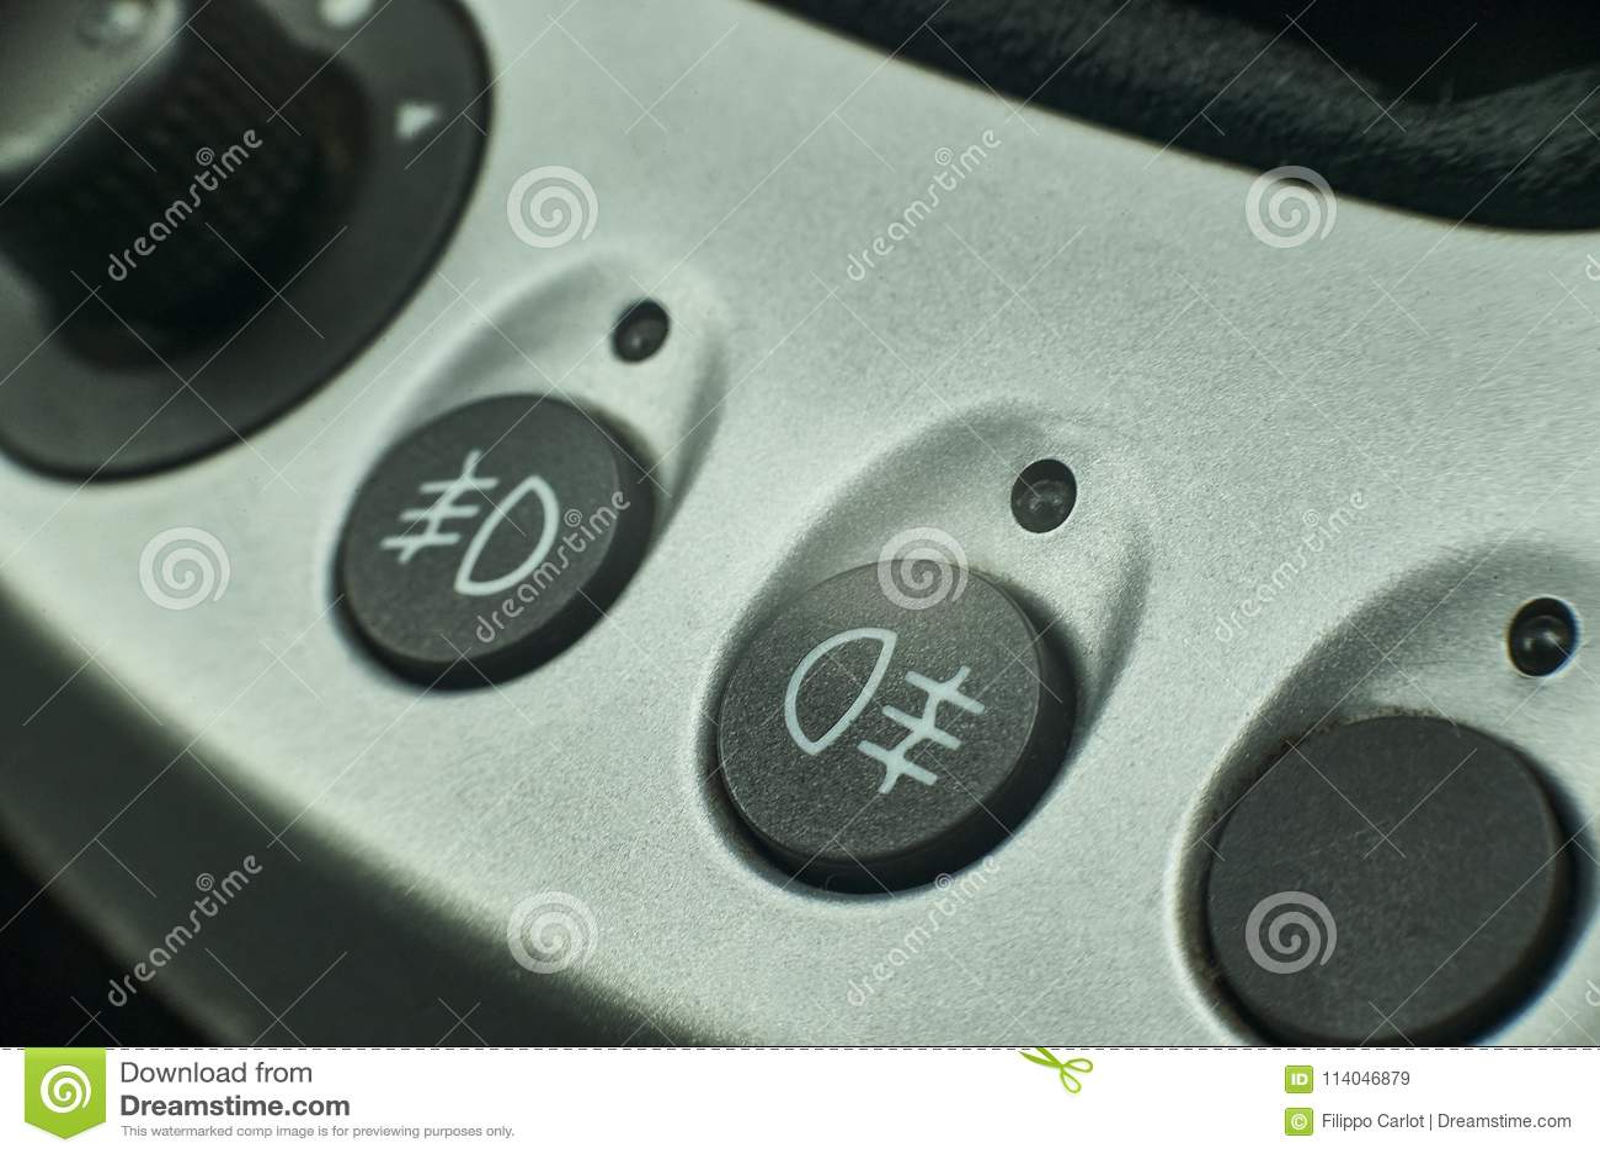 Fog Lights Symbol Of A Car Stock Image Image Of Headlights 114046879